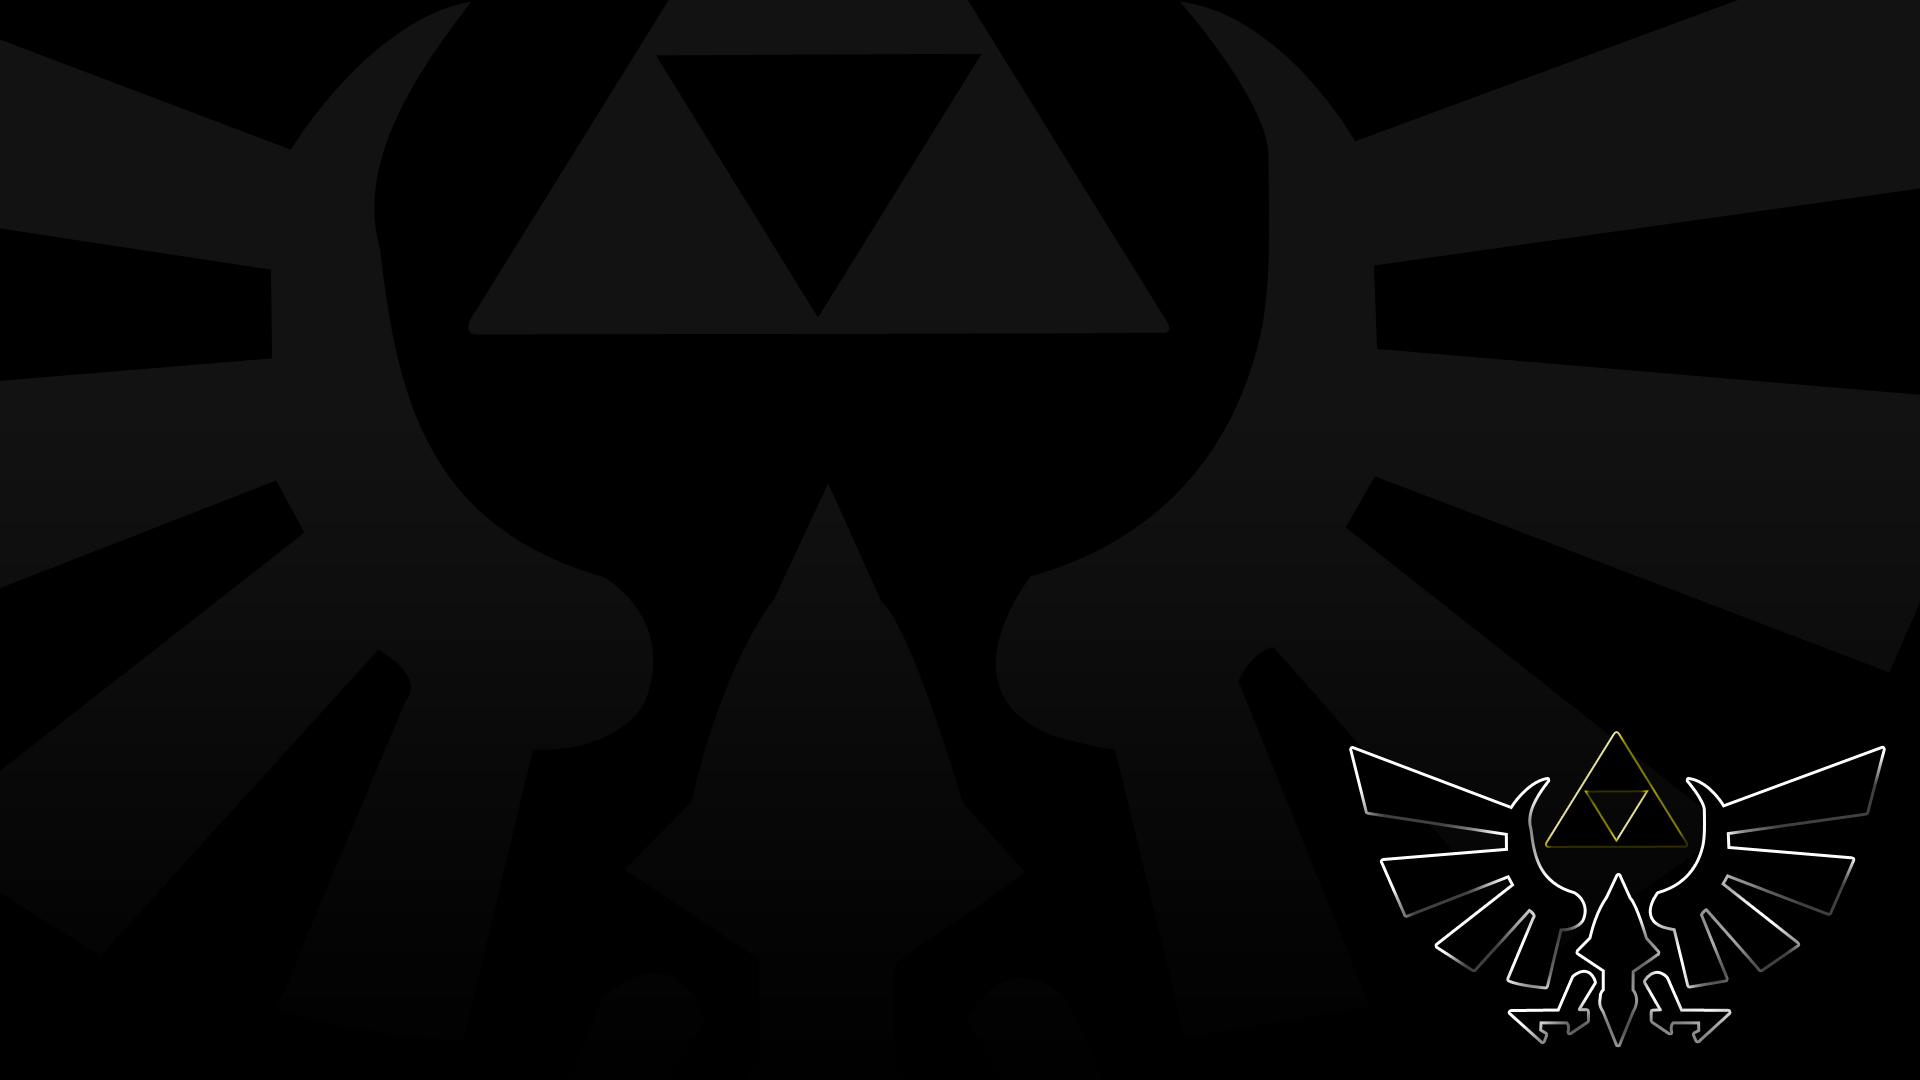 Triforce The Wallpaper 1920x1080 Triforce The Legend Of Zelda 1920x1080